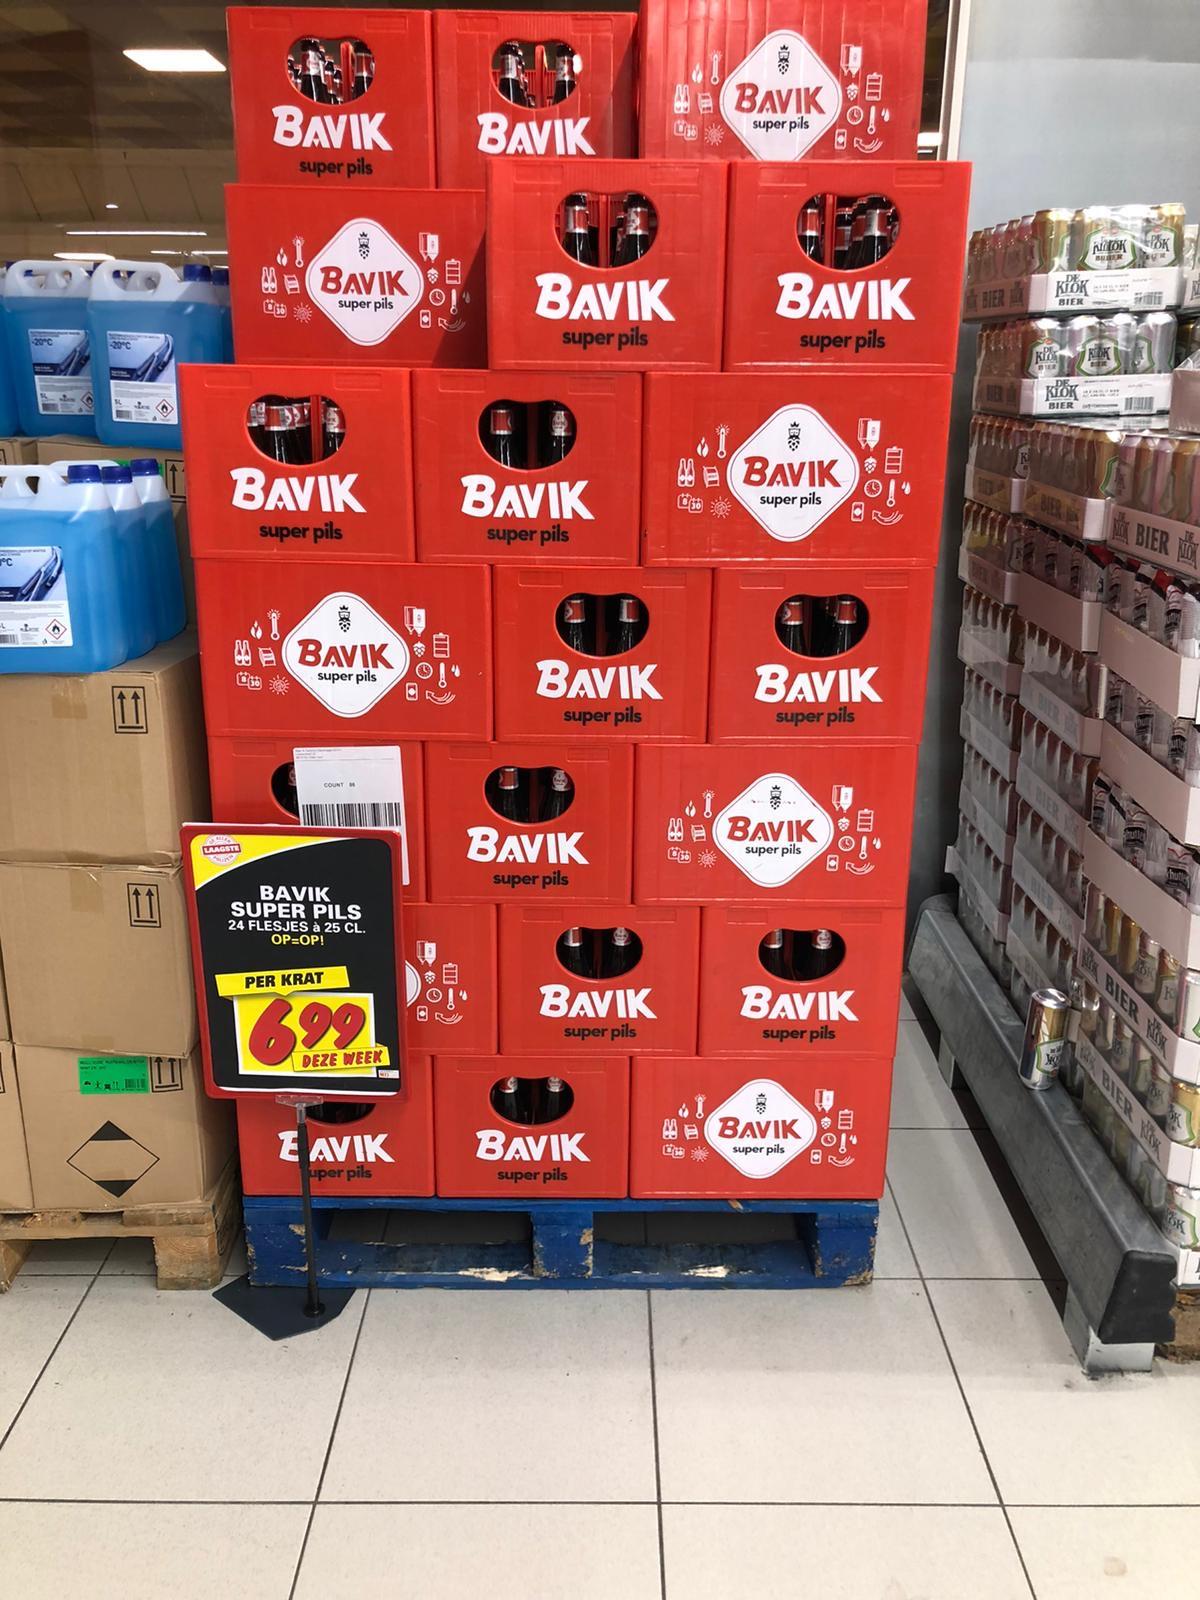 Bavik Super Pils Krat, 24 flessen bier @Nettorama